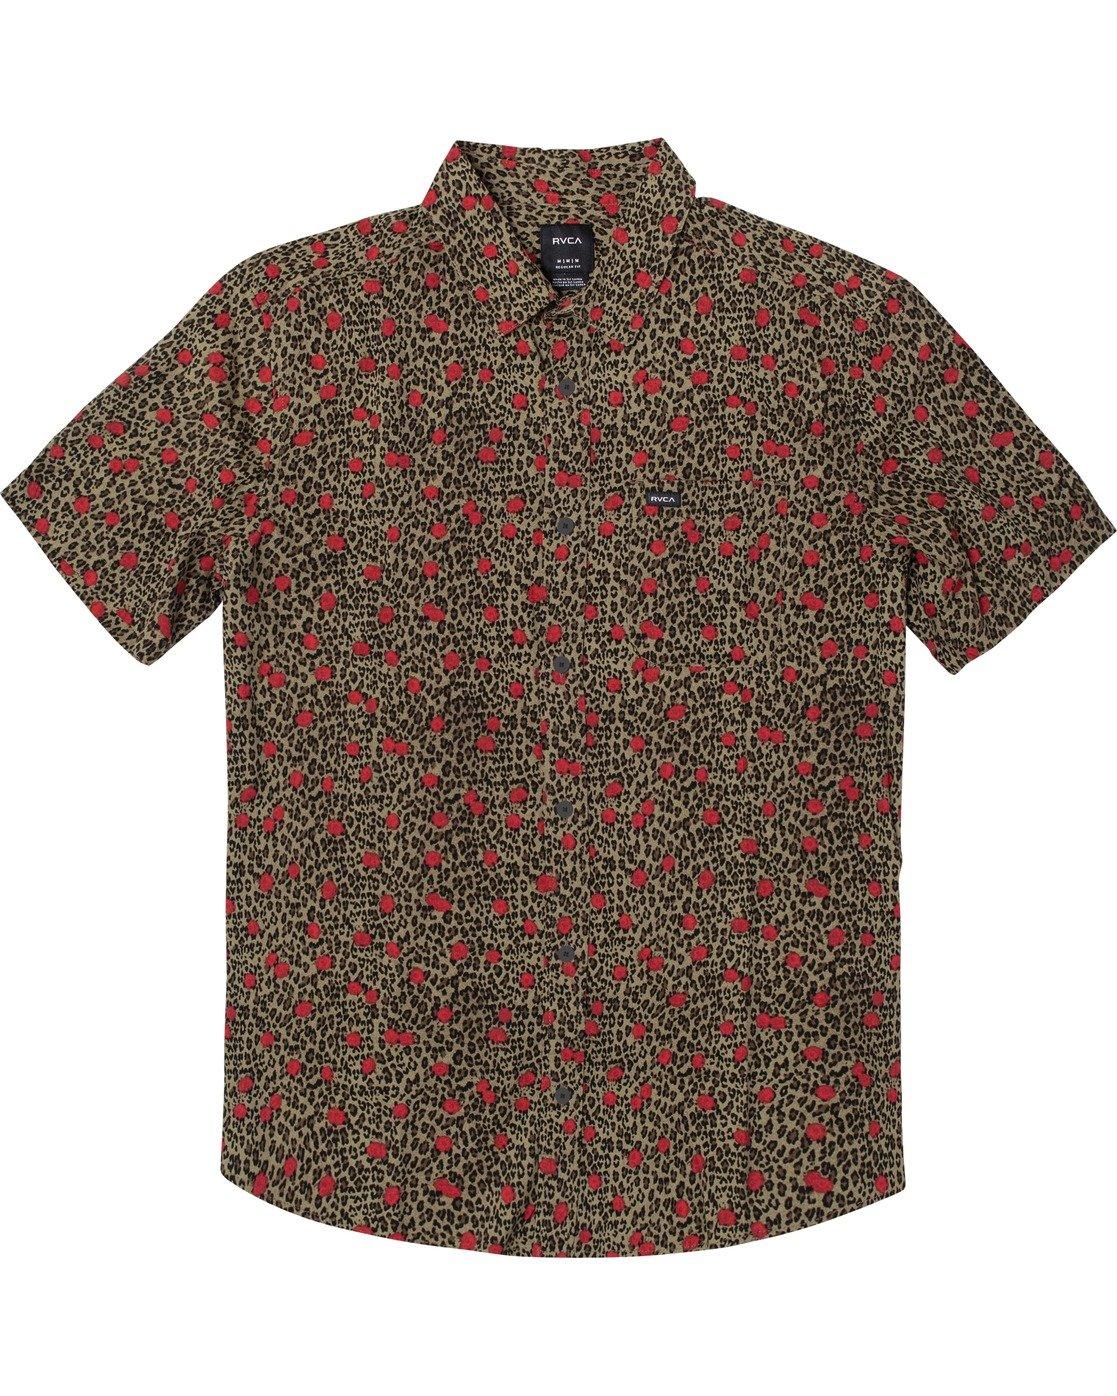 0 Jungle Fuzz - Short Sleeve Shirt for Men Green U1SHRCRVF0 RVCA